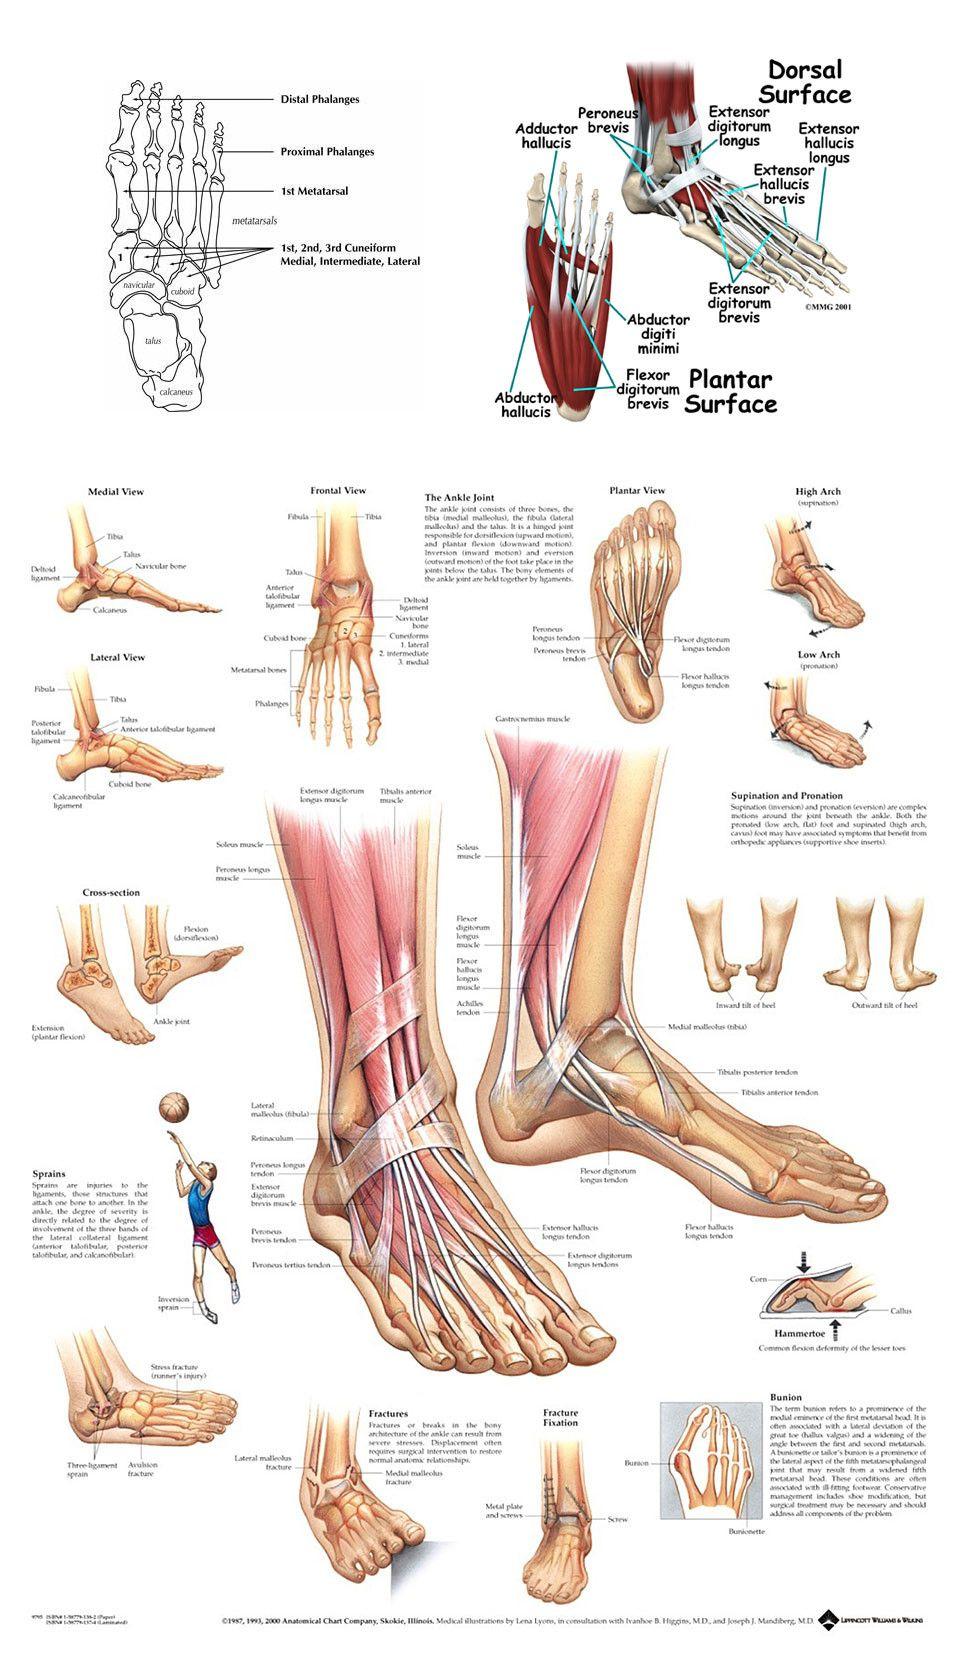 hight resolution of ankle bones diagram ankle bones diagram left foot tendon diagram anatomy coloring pages bones google